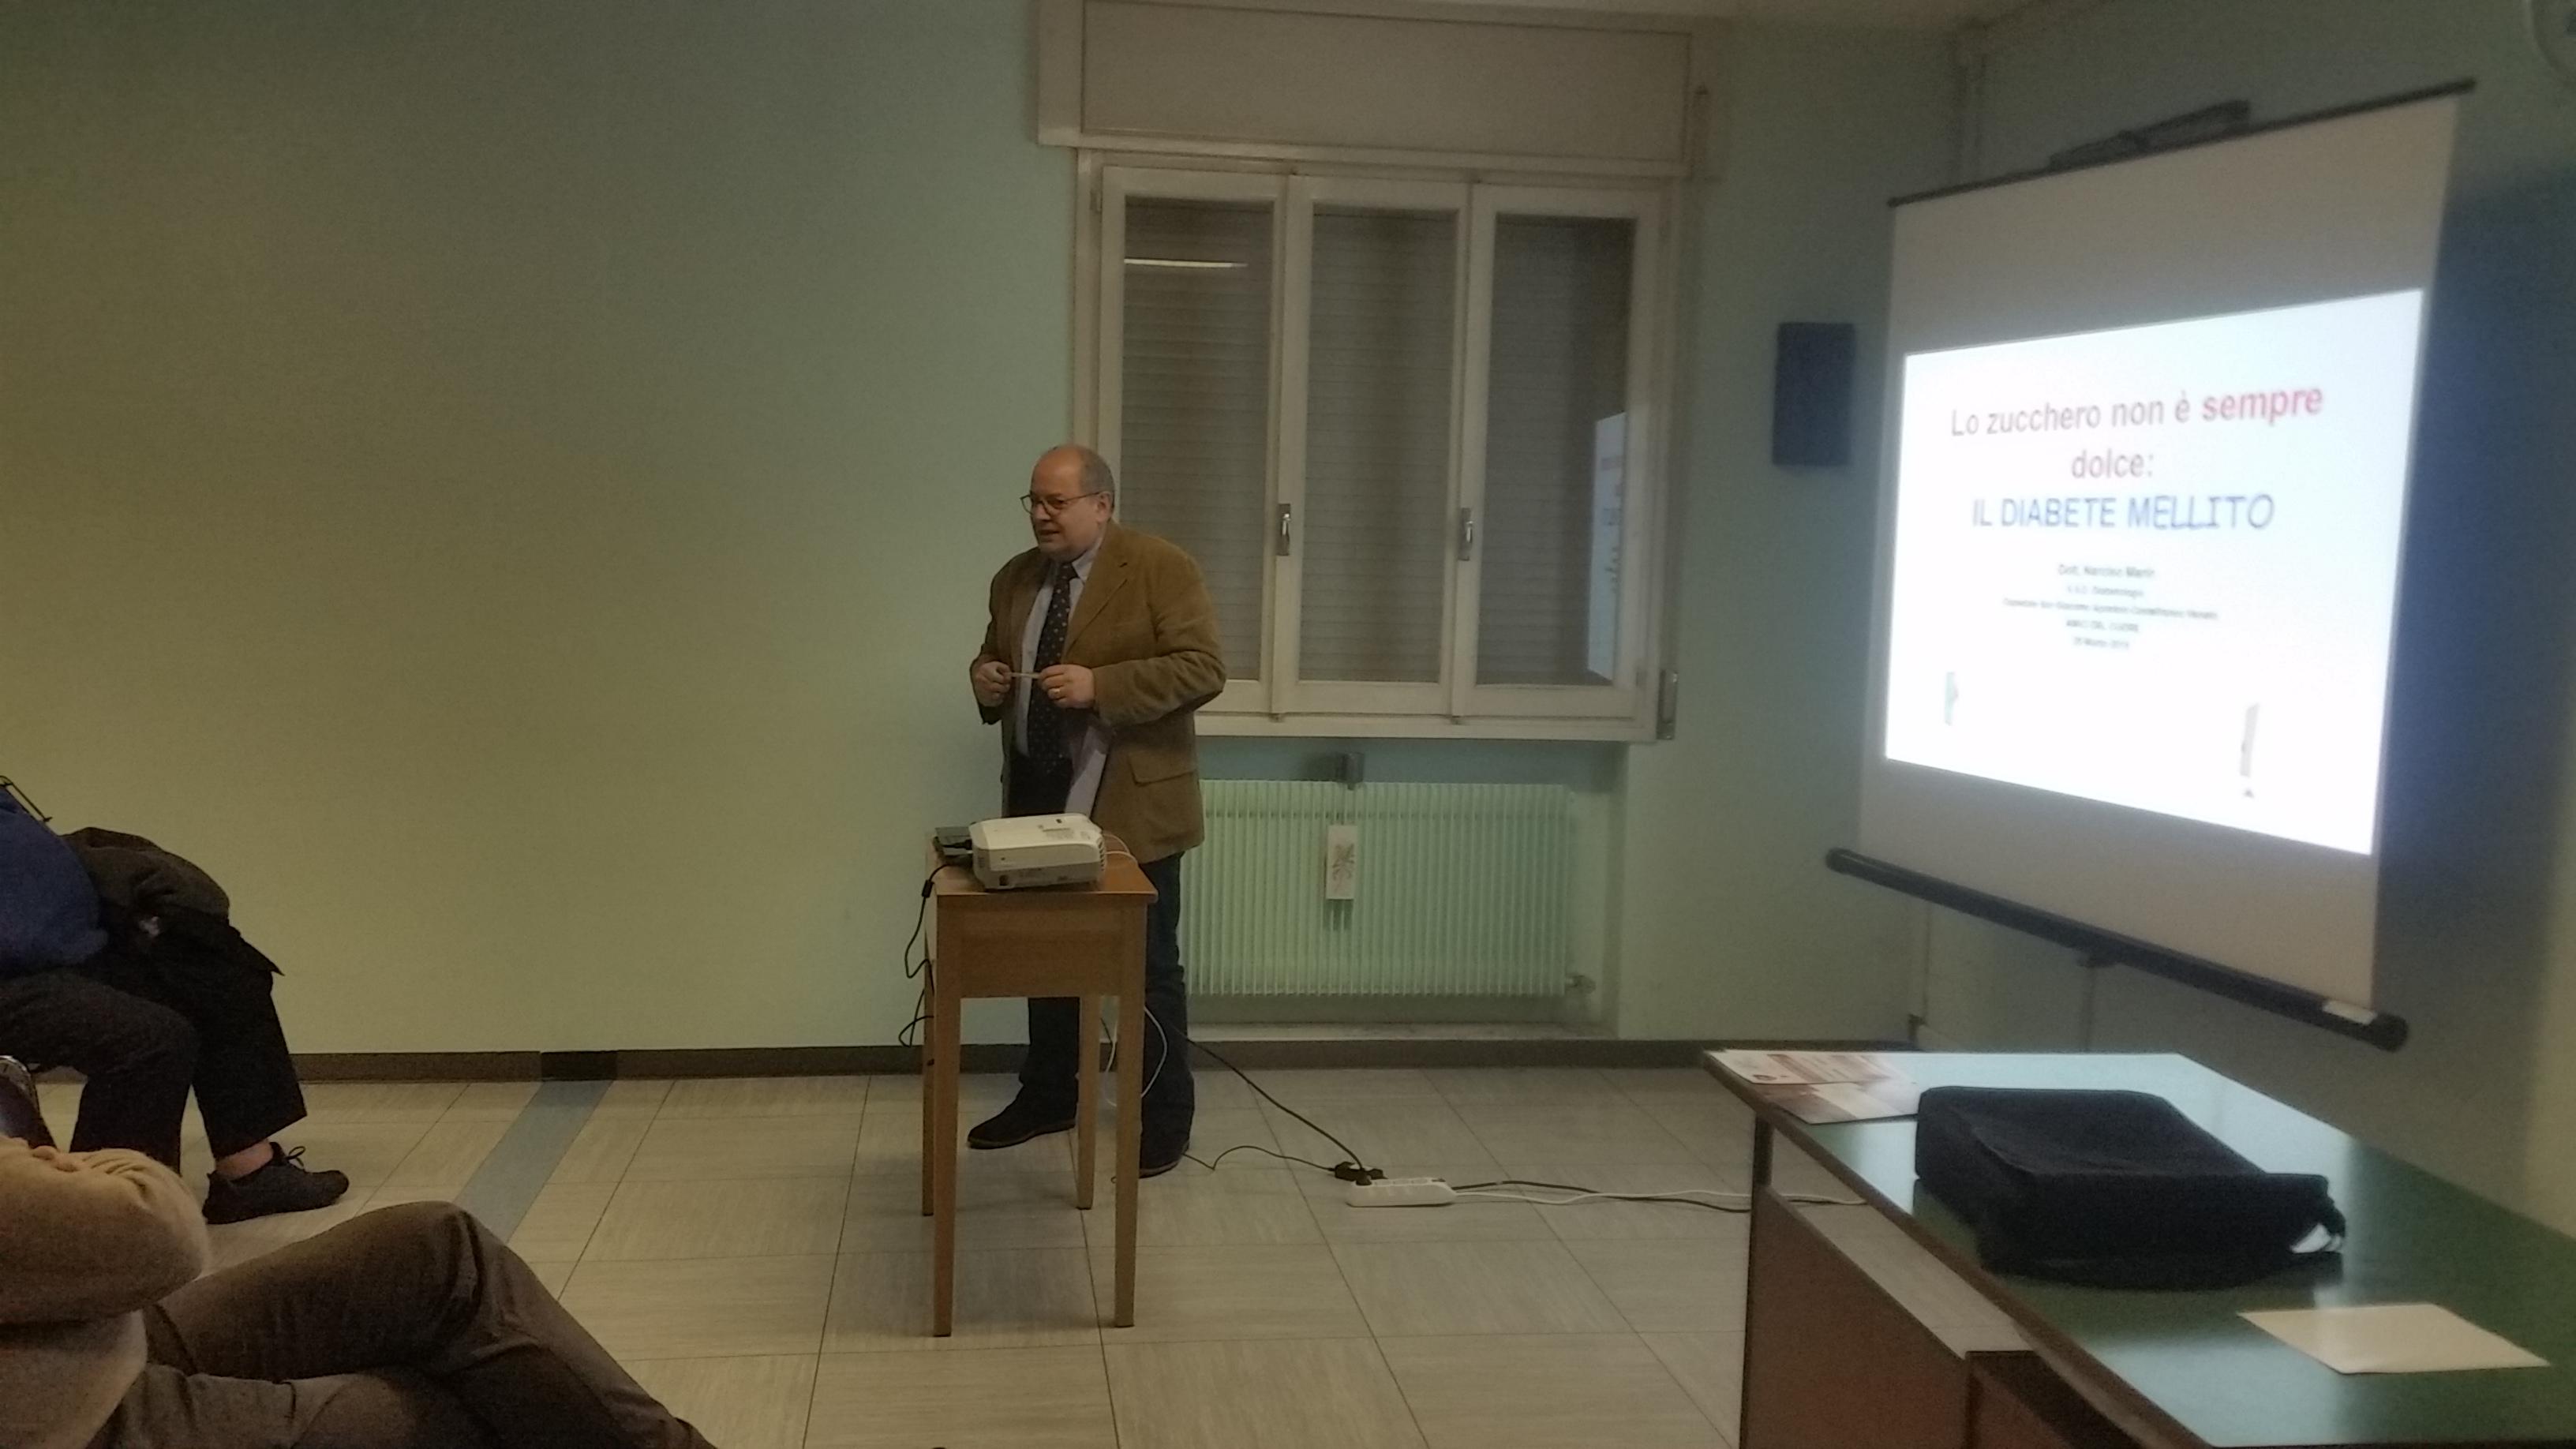 25 marzo - conferenza del dr. Narciso Marin